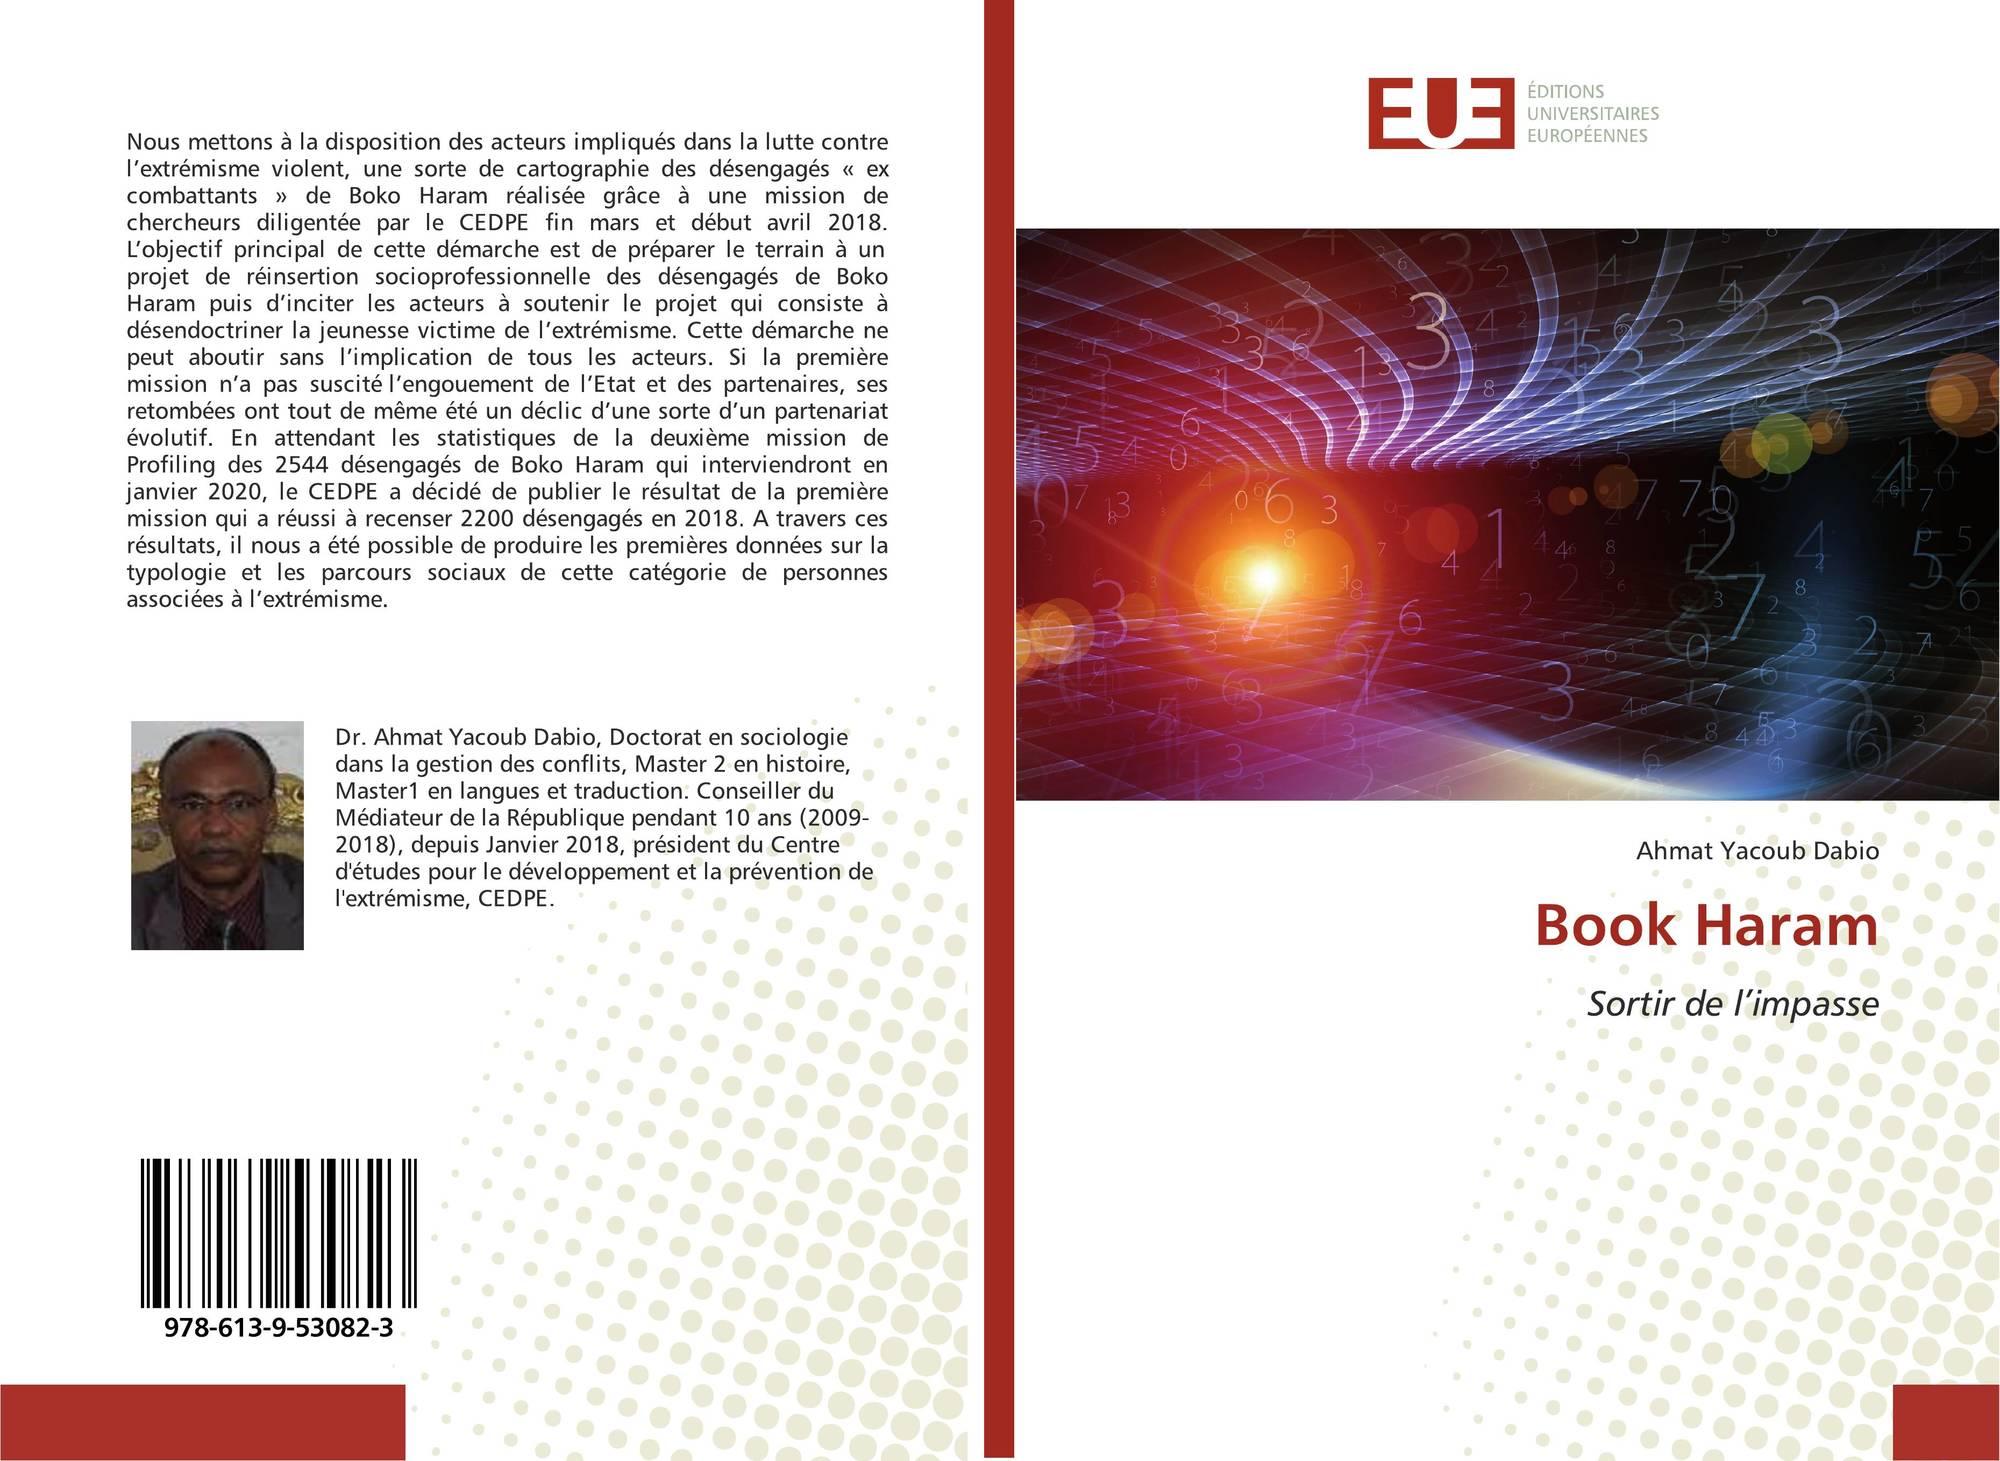 https://www.morebooks.shop/store/fr/book/book-haram/isbn/978-613-9-53082-3